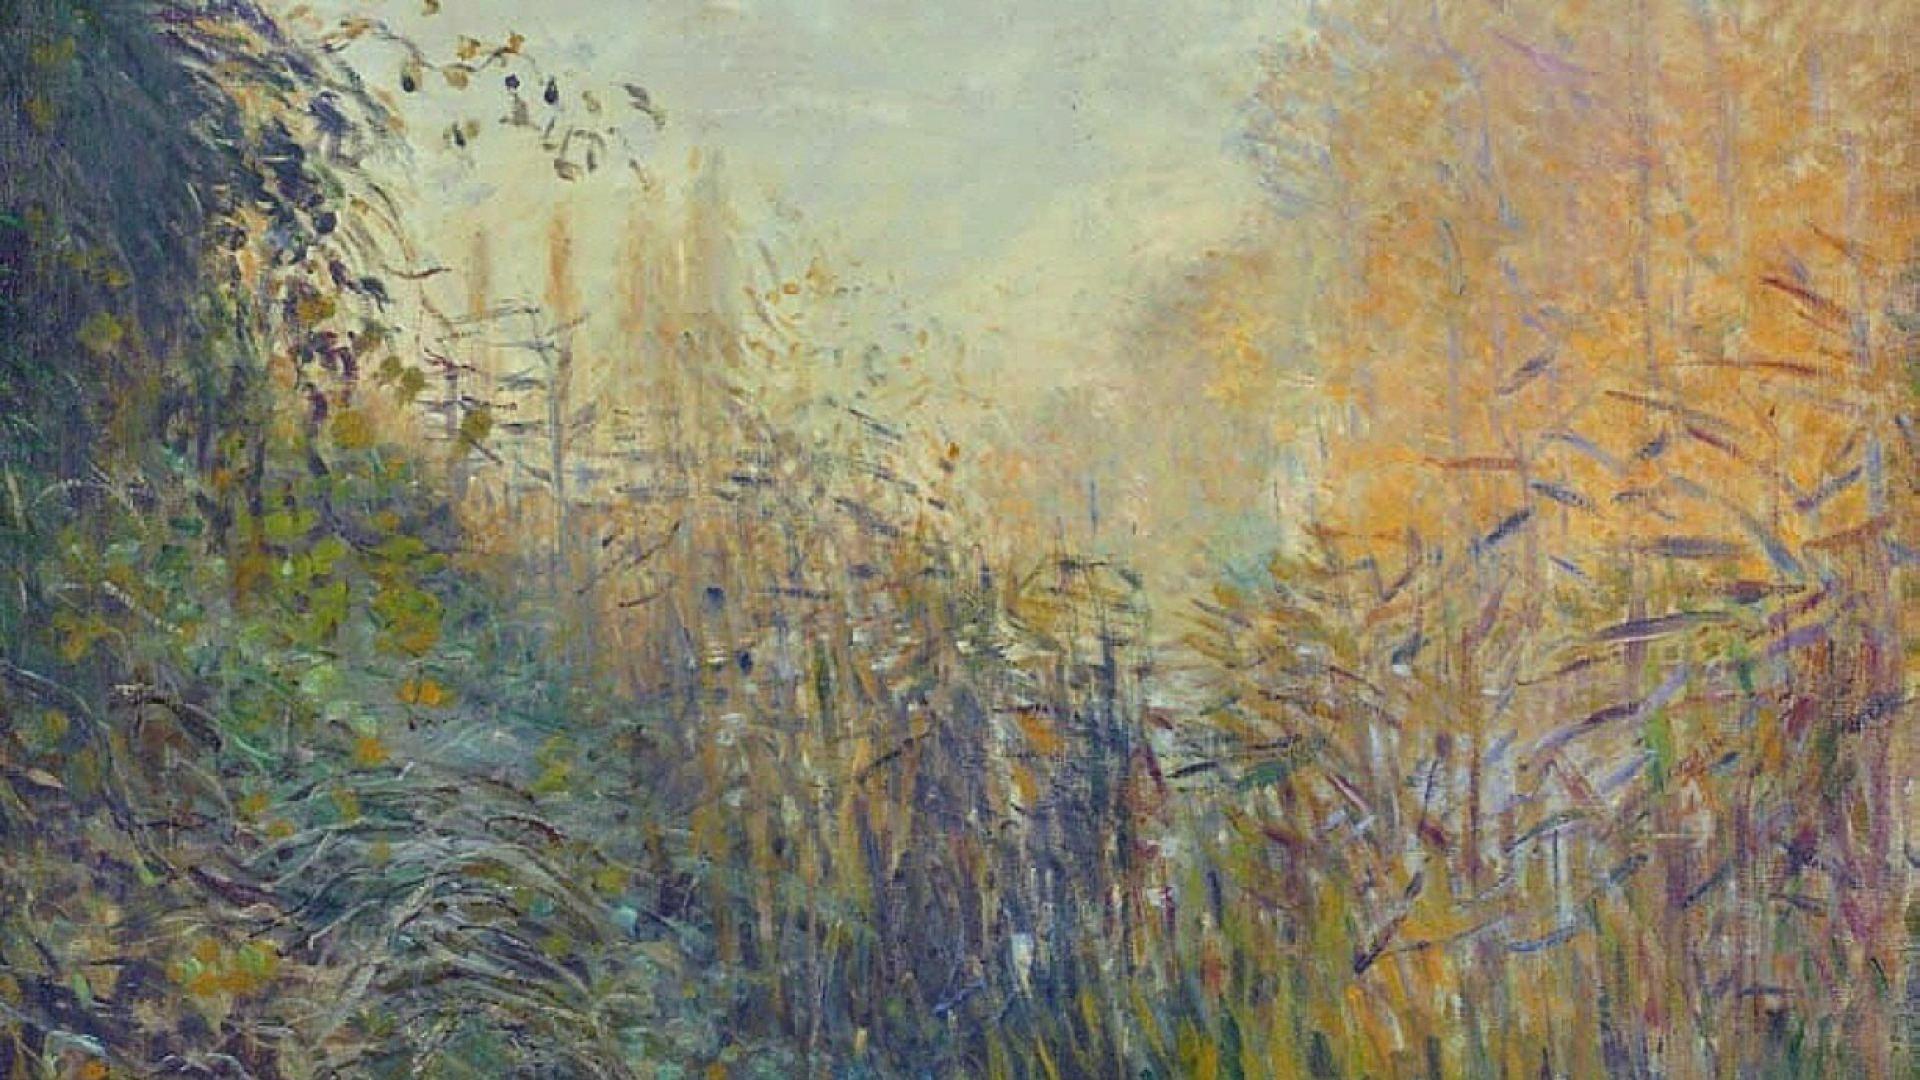 Impressionism Wallpapers HD Download 1920x1080